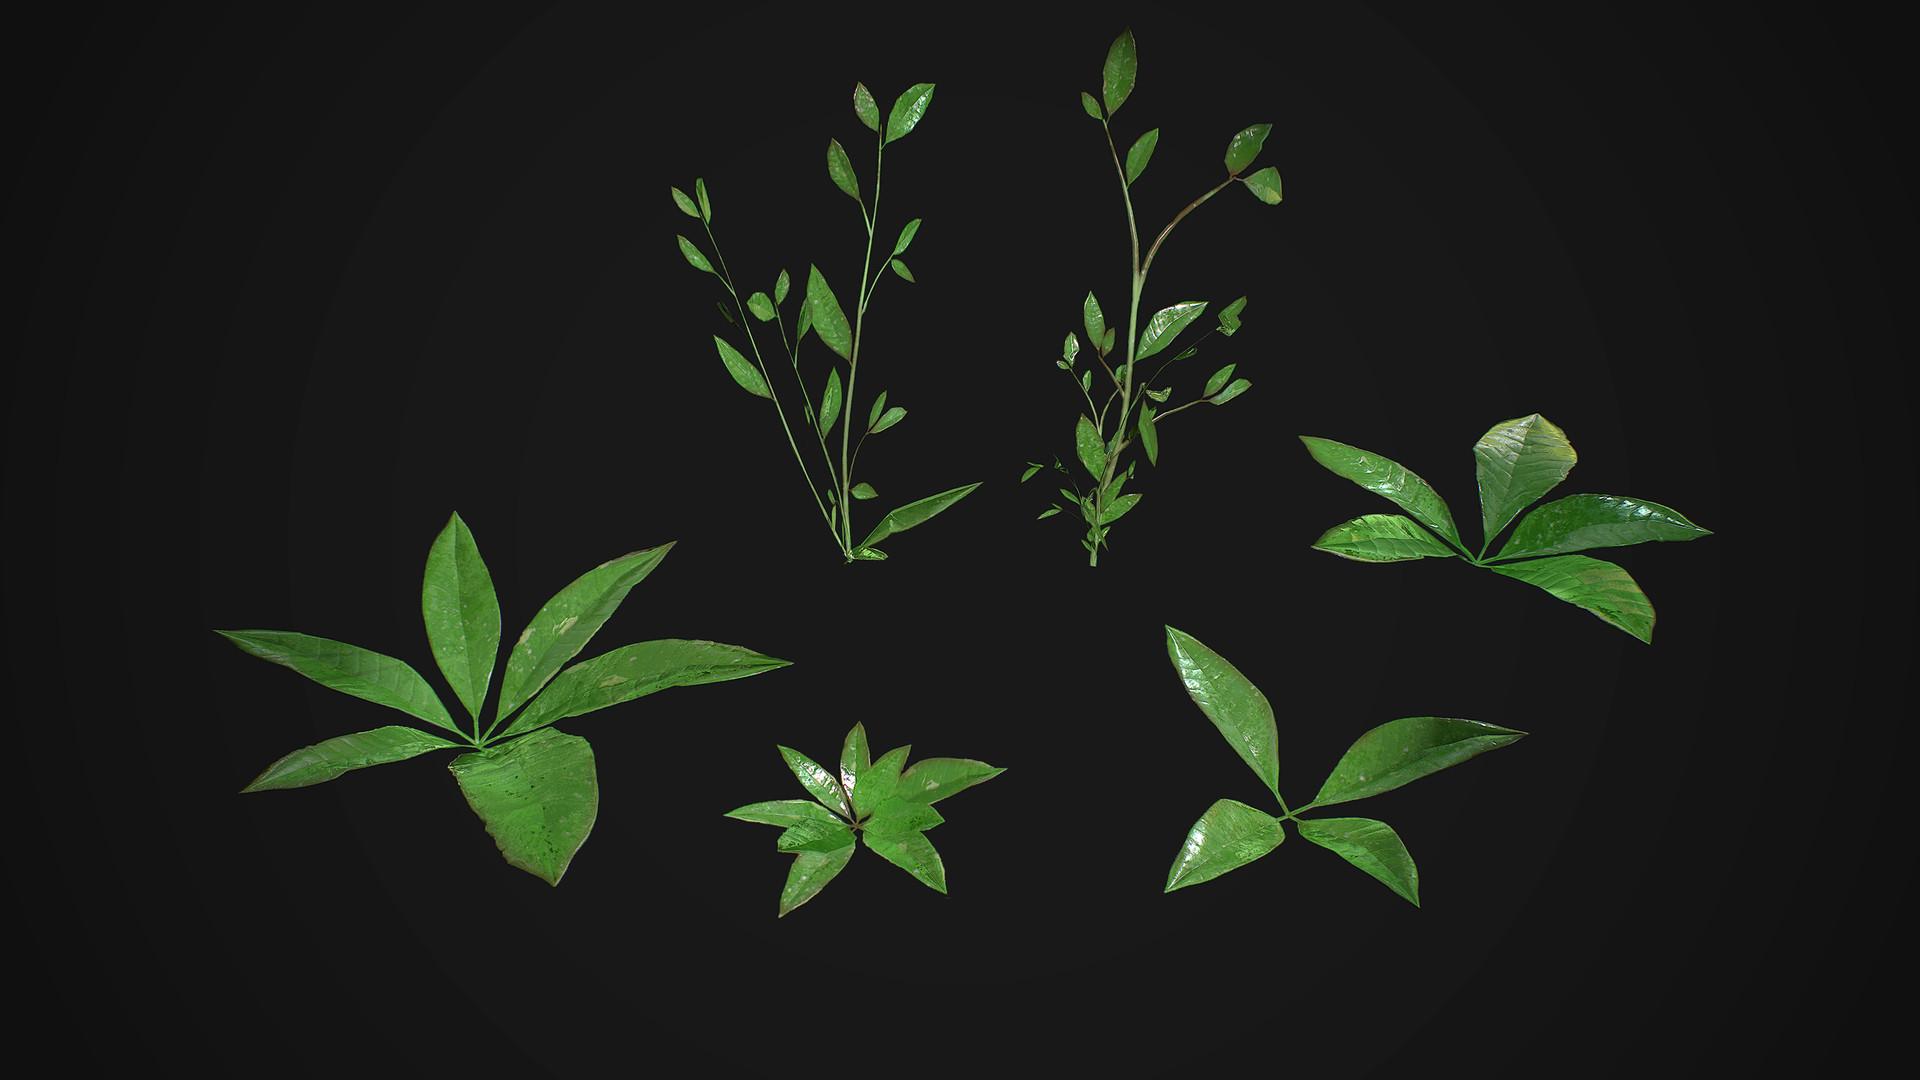 Sebastian schulz weeds marmo